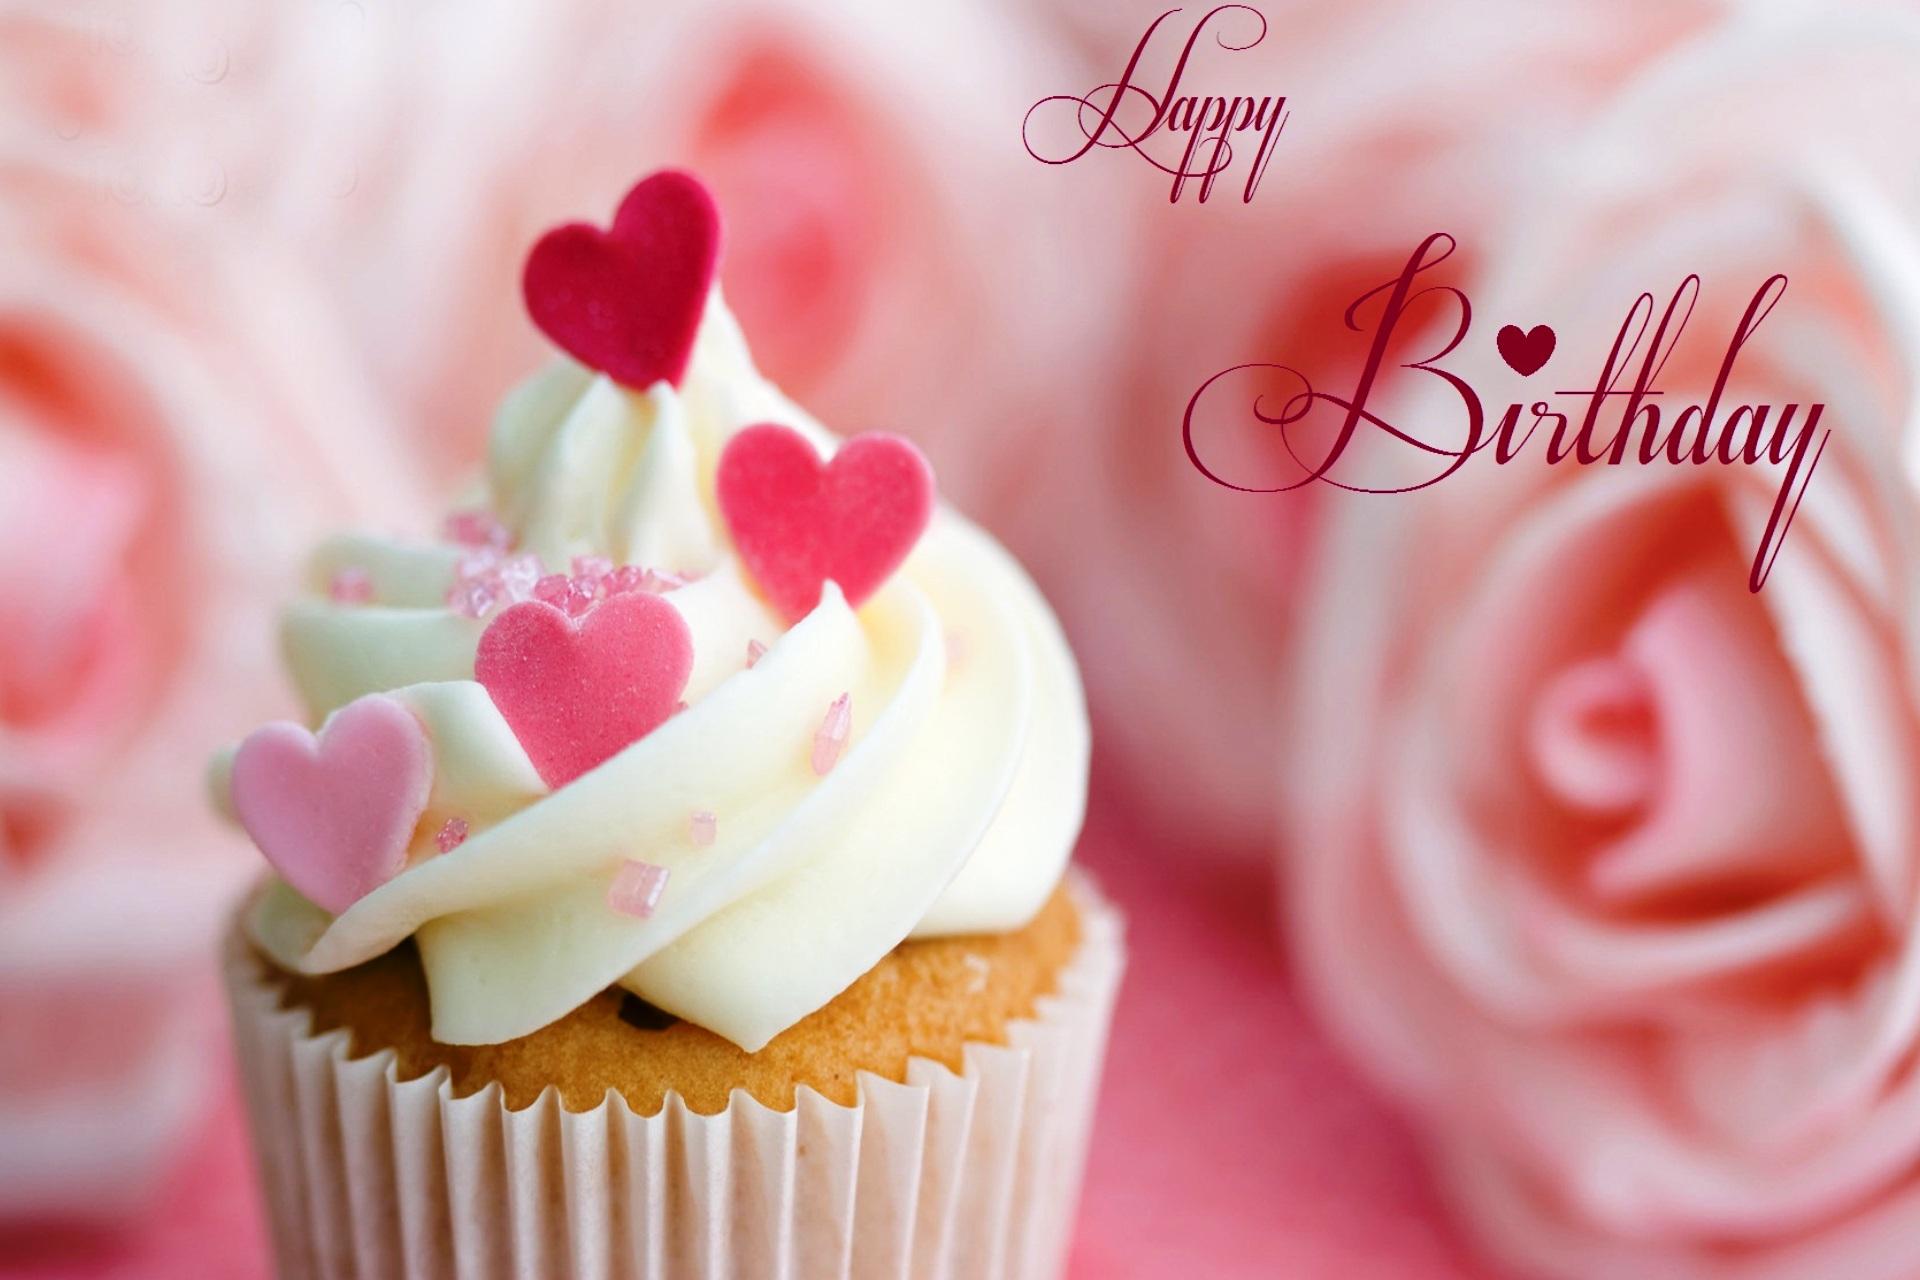 Cute Lovely Wallpaper For Mobile Happy Birthday Cake Pictures Pixelstalk Net